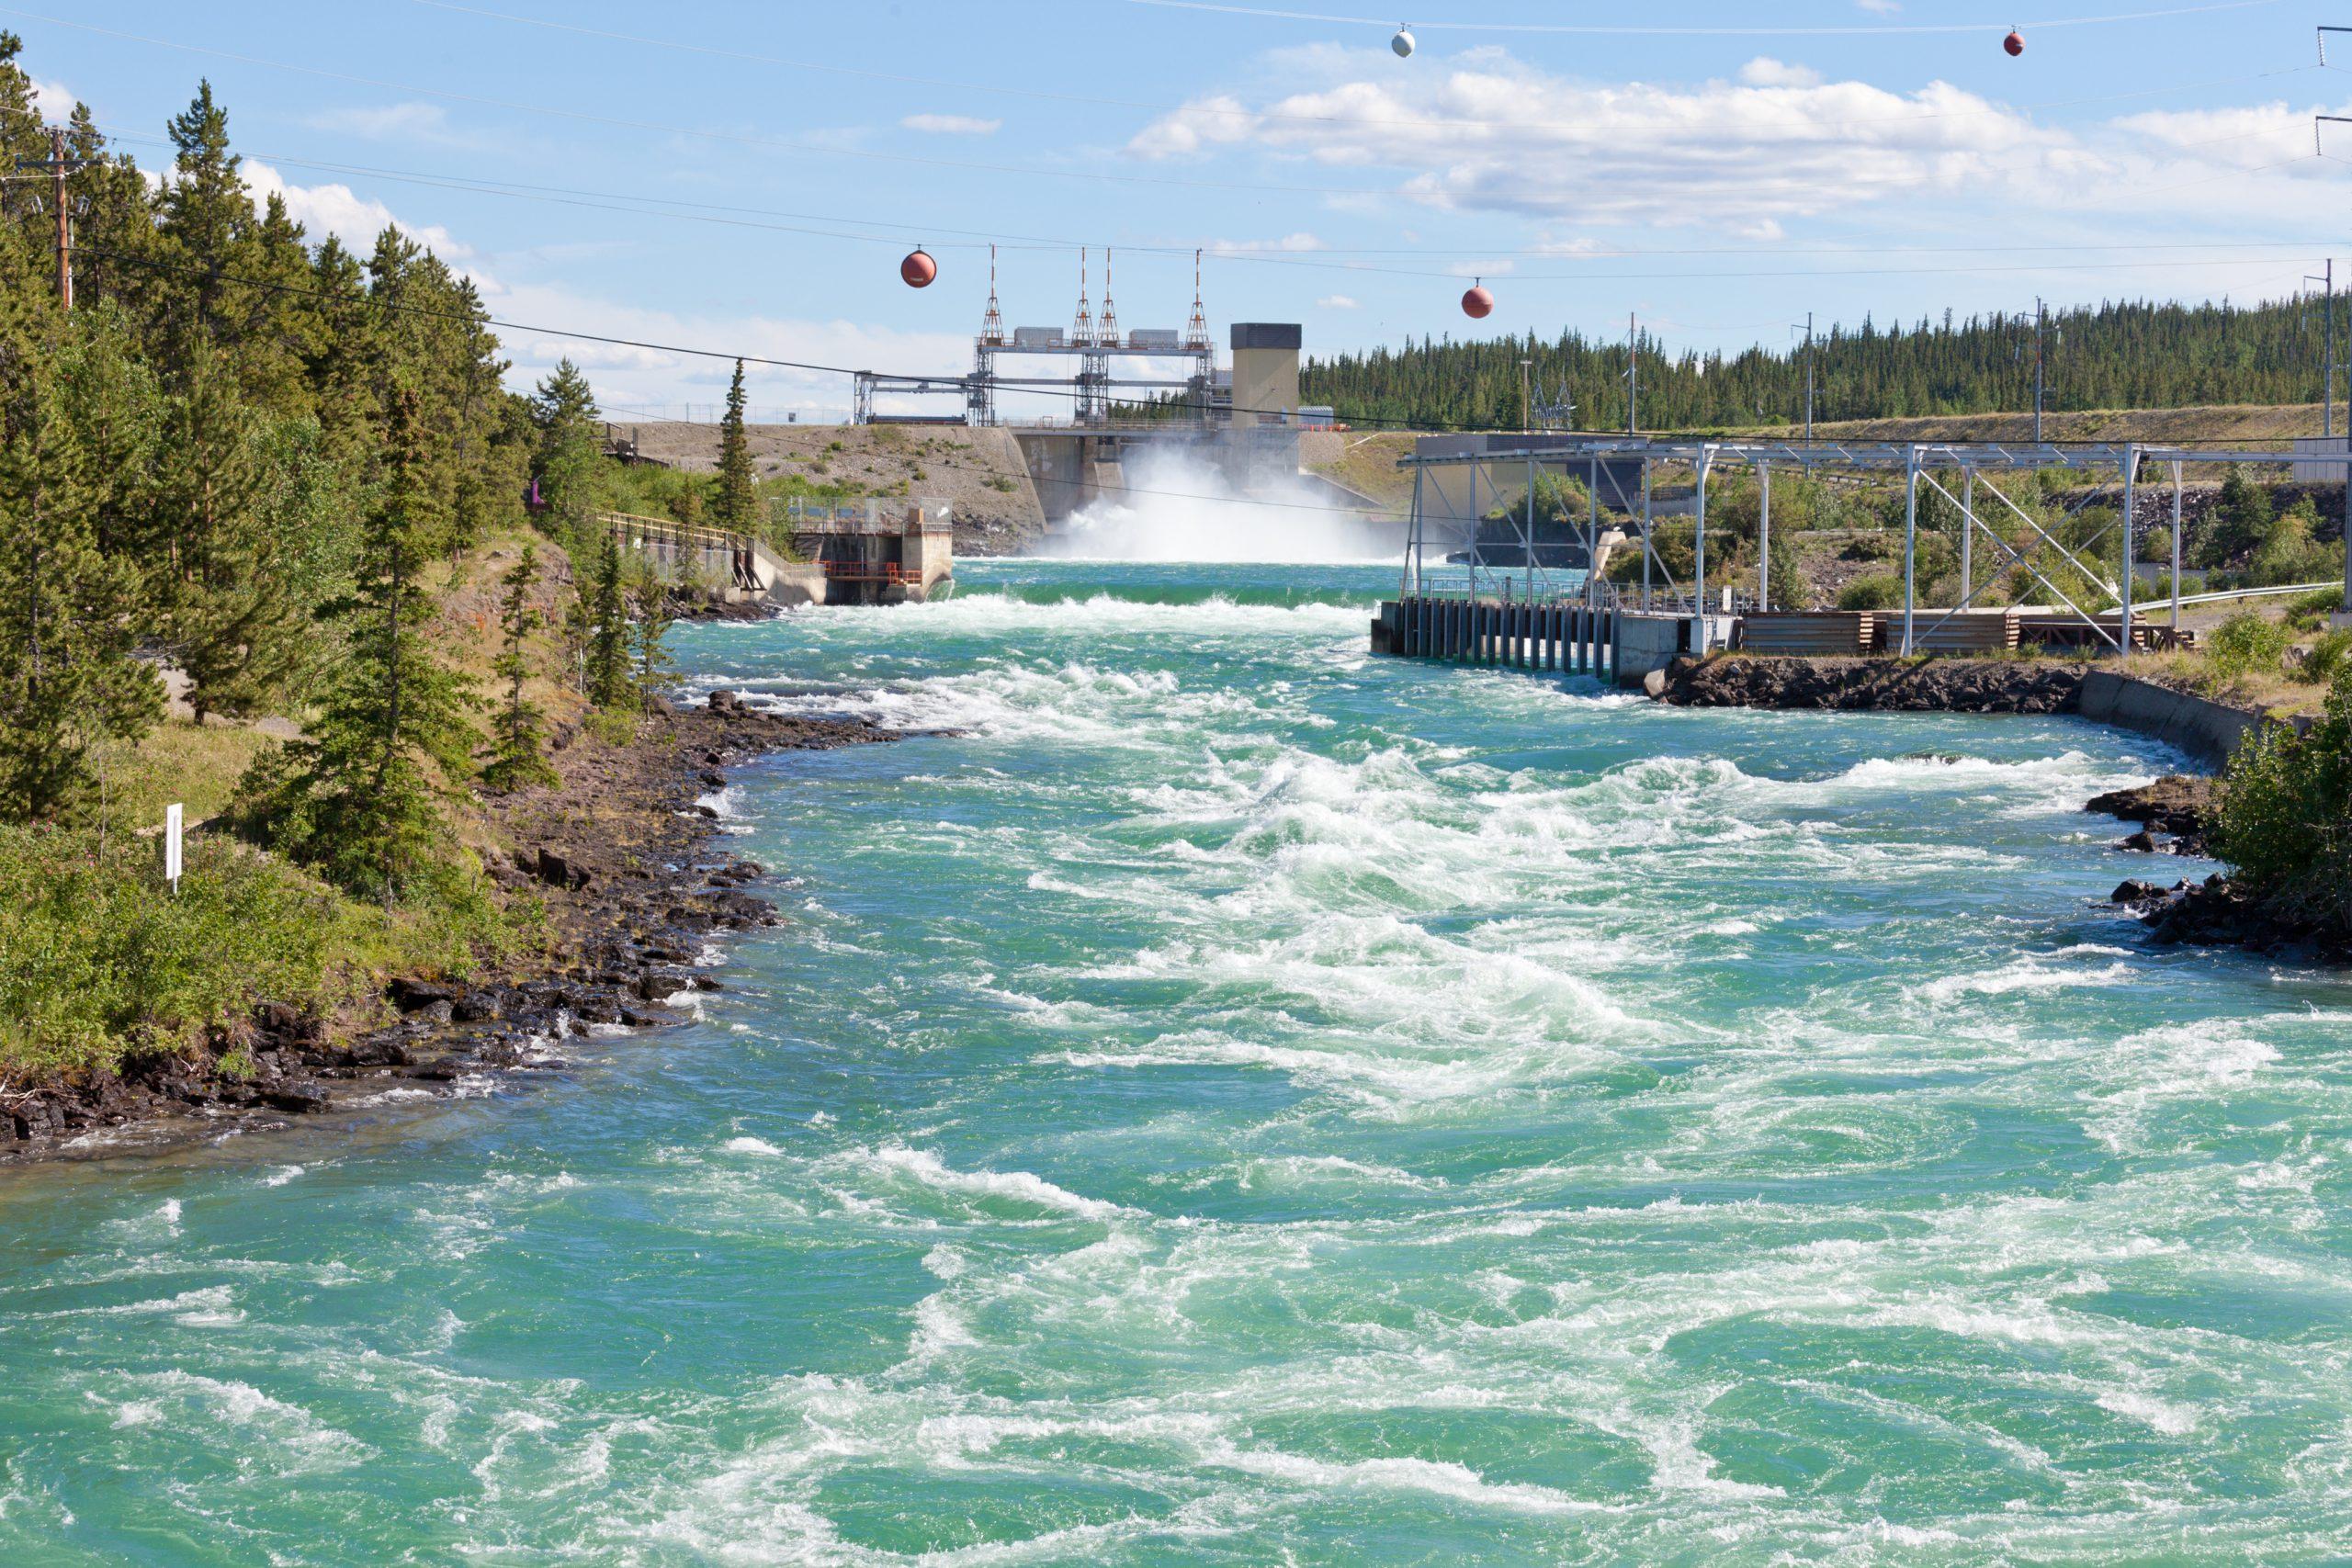 hidropower plant